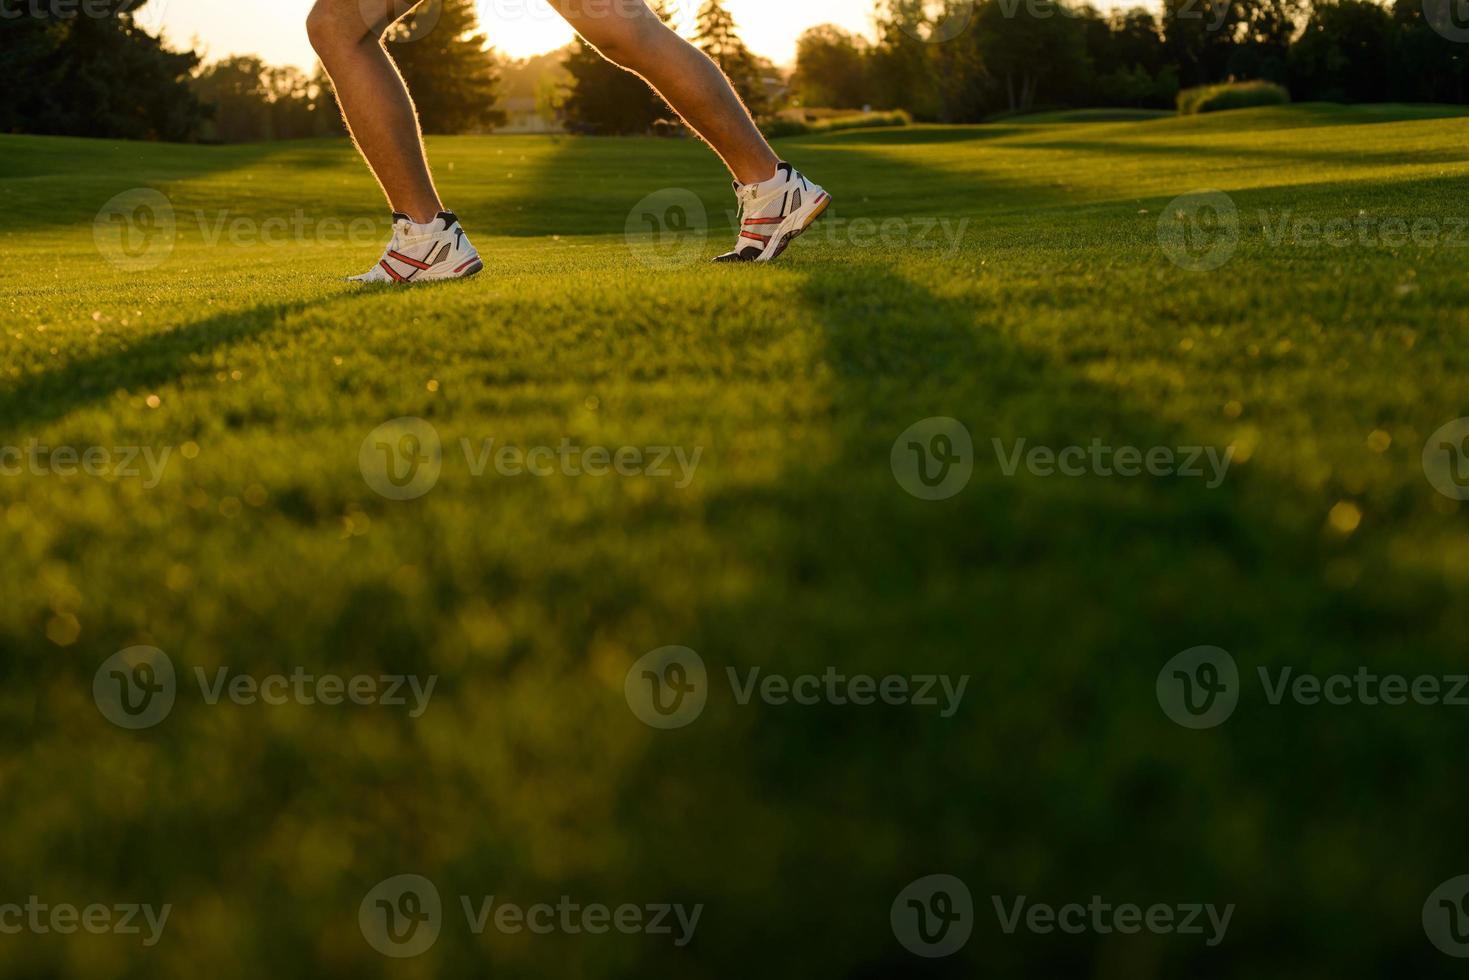 ben av idrottsman. foto